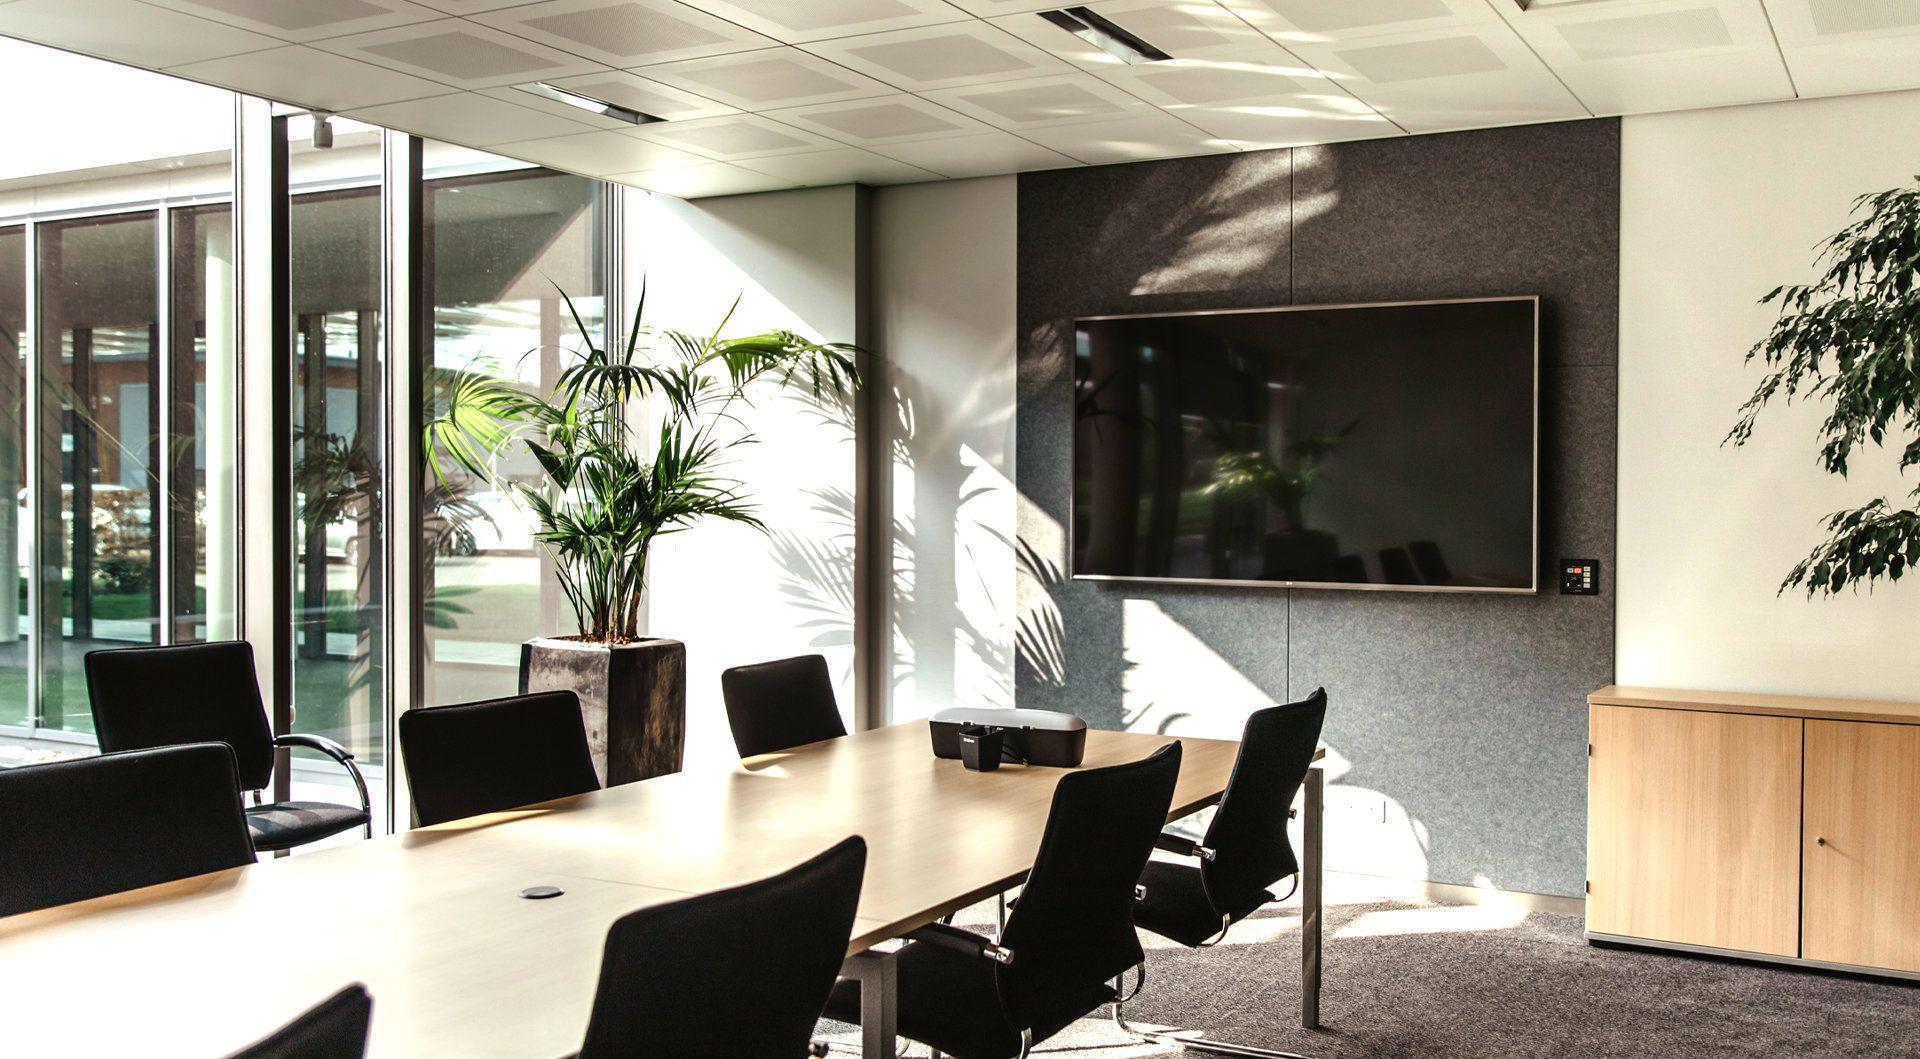 "Benq BH2801N Digitale signage flatscreen 71,1 cm (28"") LED Zwart - Case studie de vries"